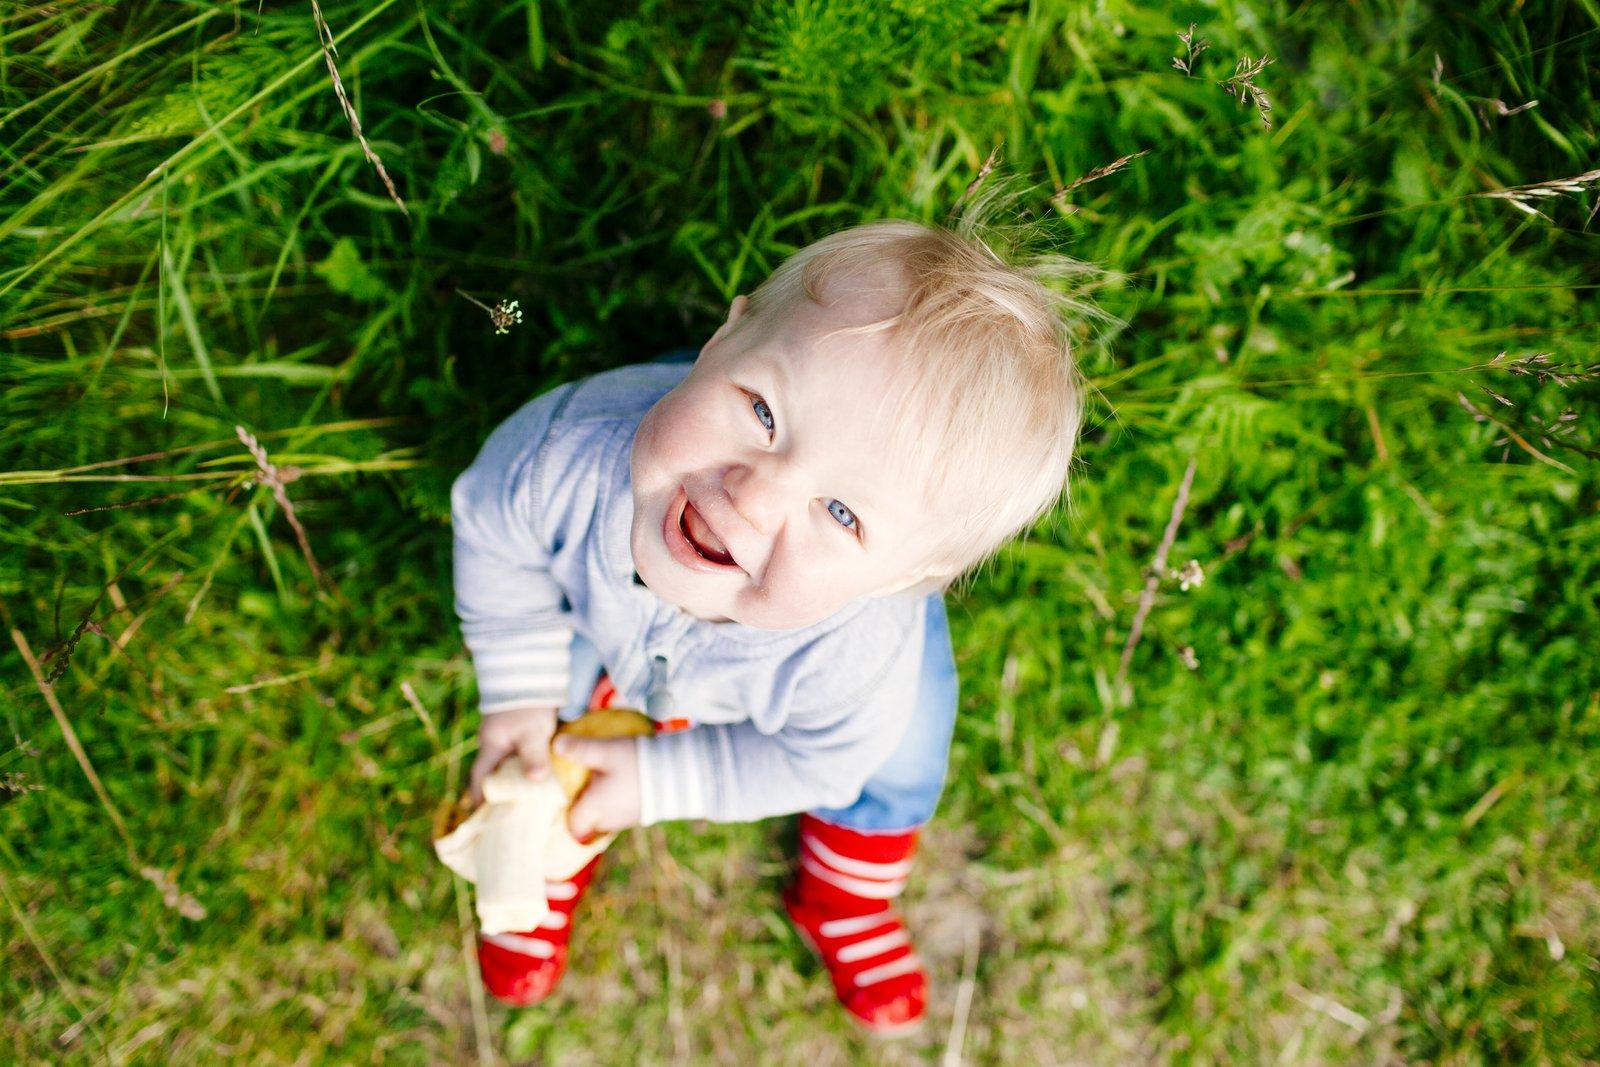 Baby on grass - Swedish boy names